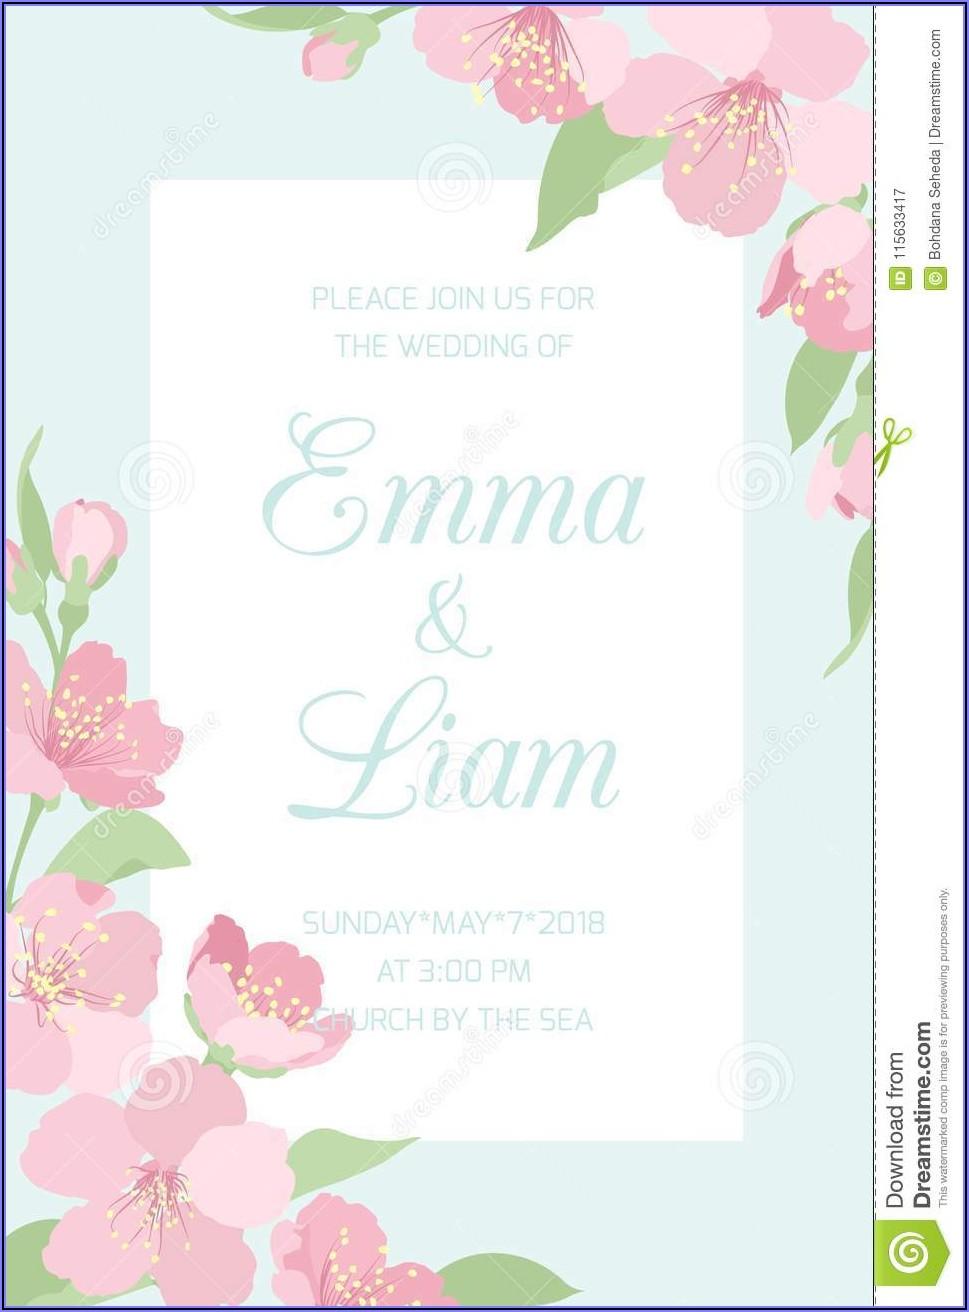 Wedding Invitation Cherry Blossom Design